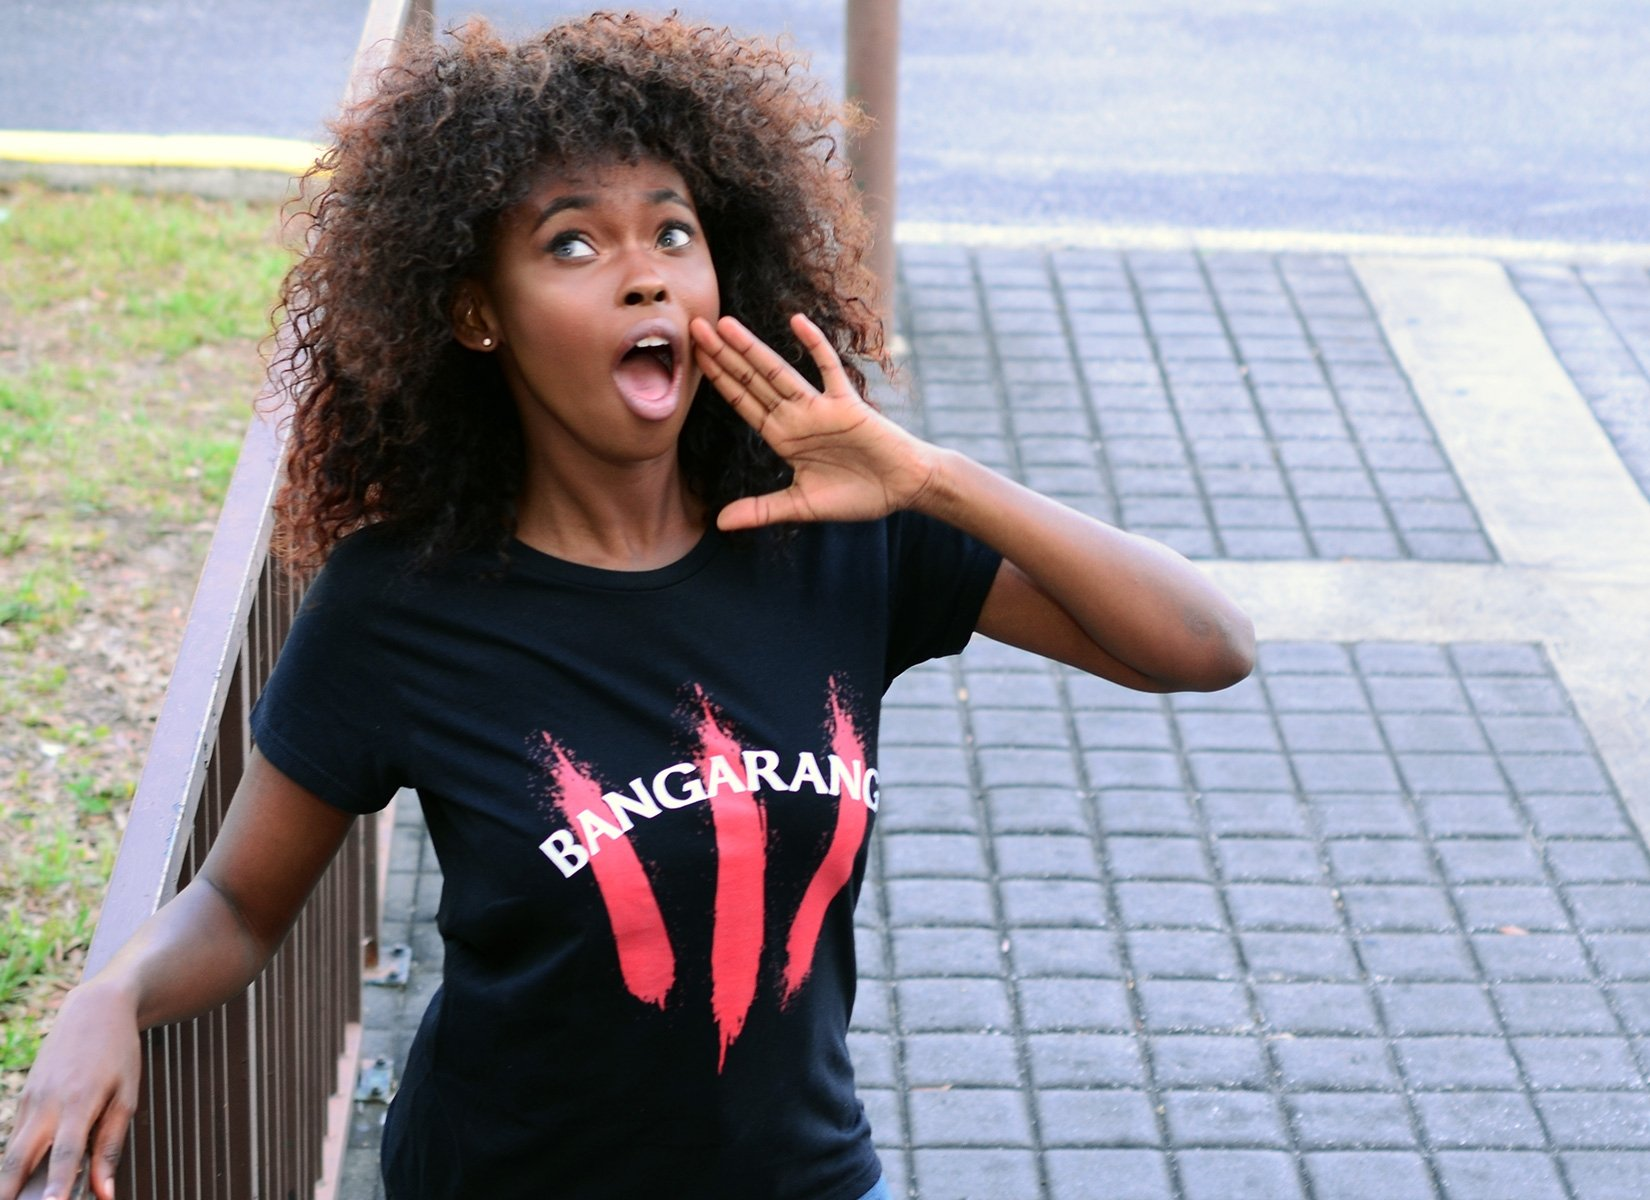 Bangarang on Womens T-Shirt